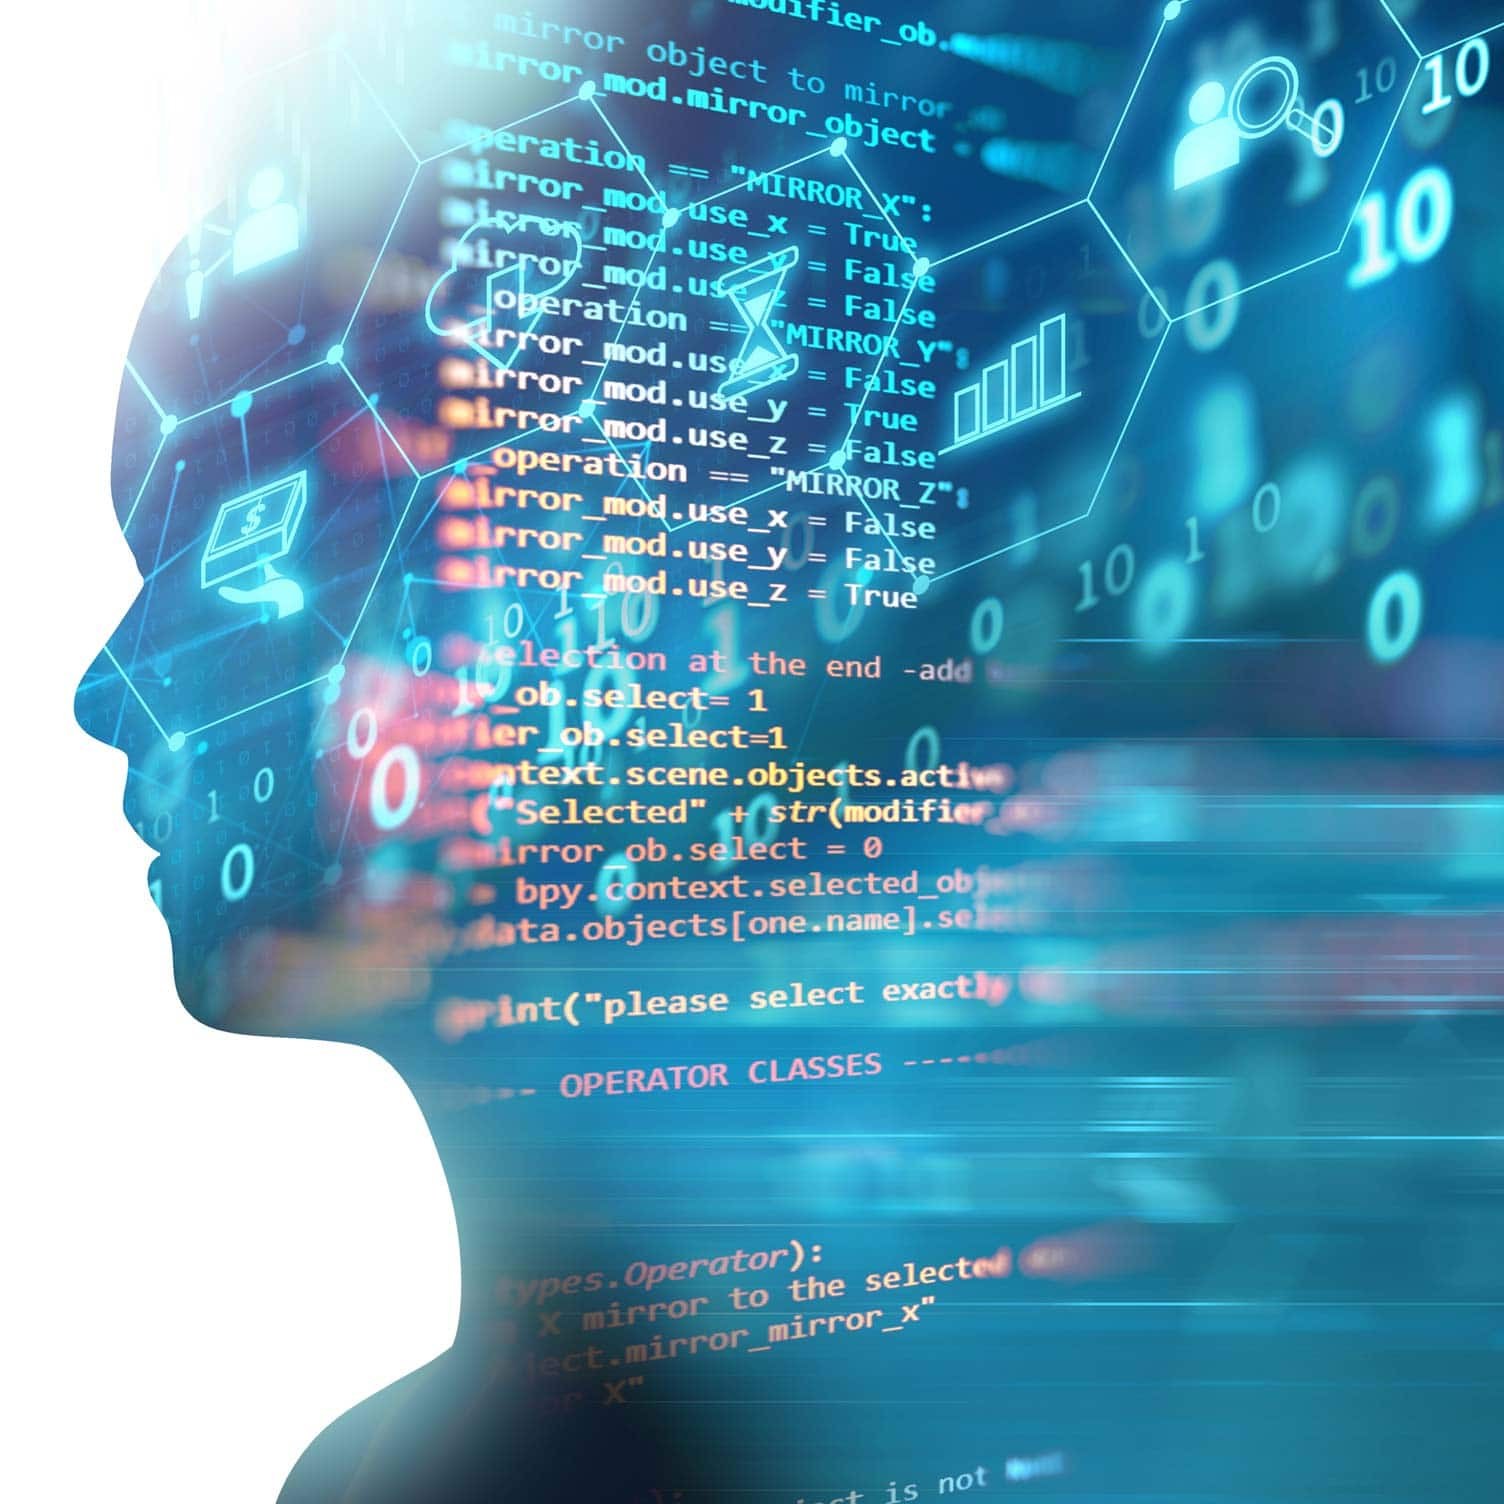 https://mk0wwwcapventisd3gqs.kinstacdn.com/wp-content/uploads/2019/12/data-science-business-analytics-square.jpg